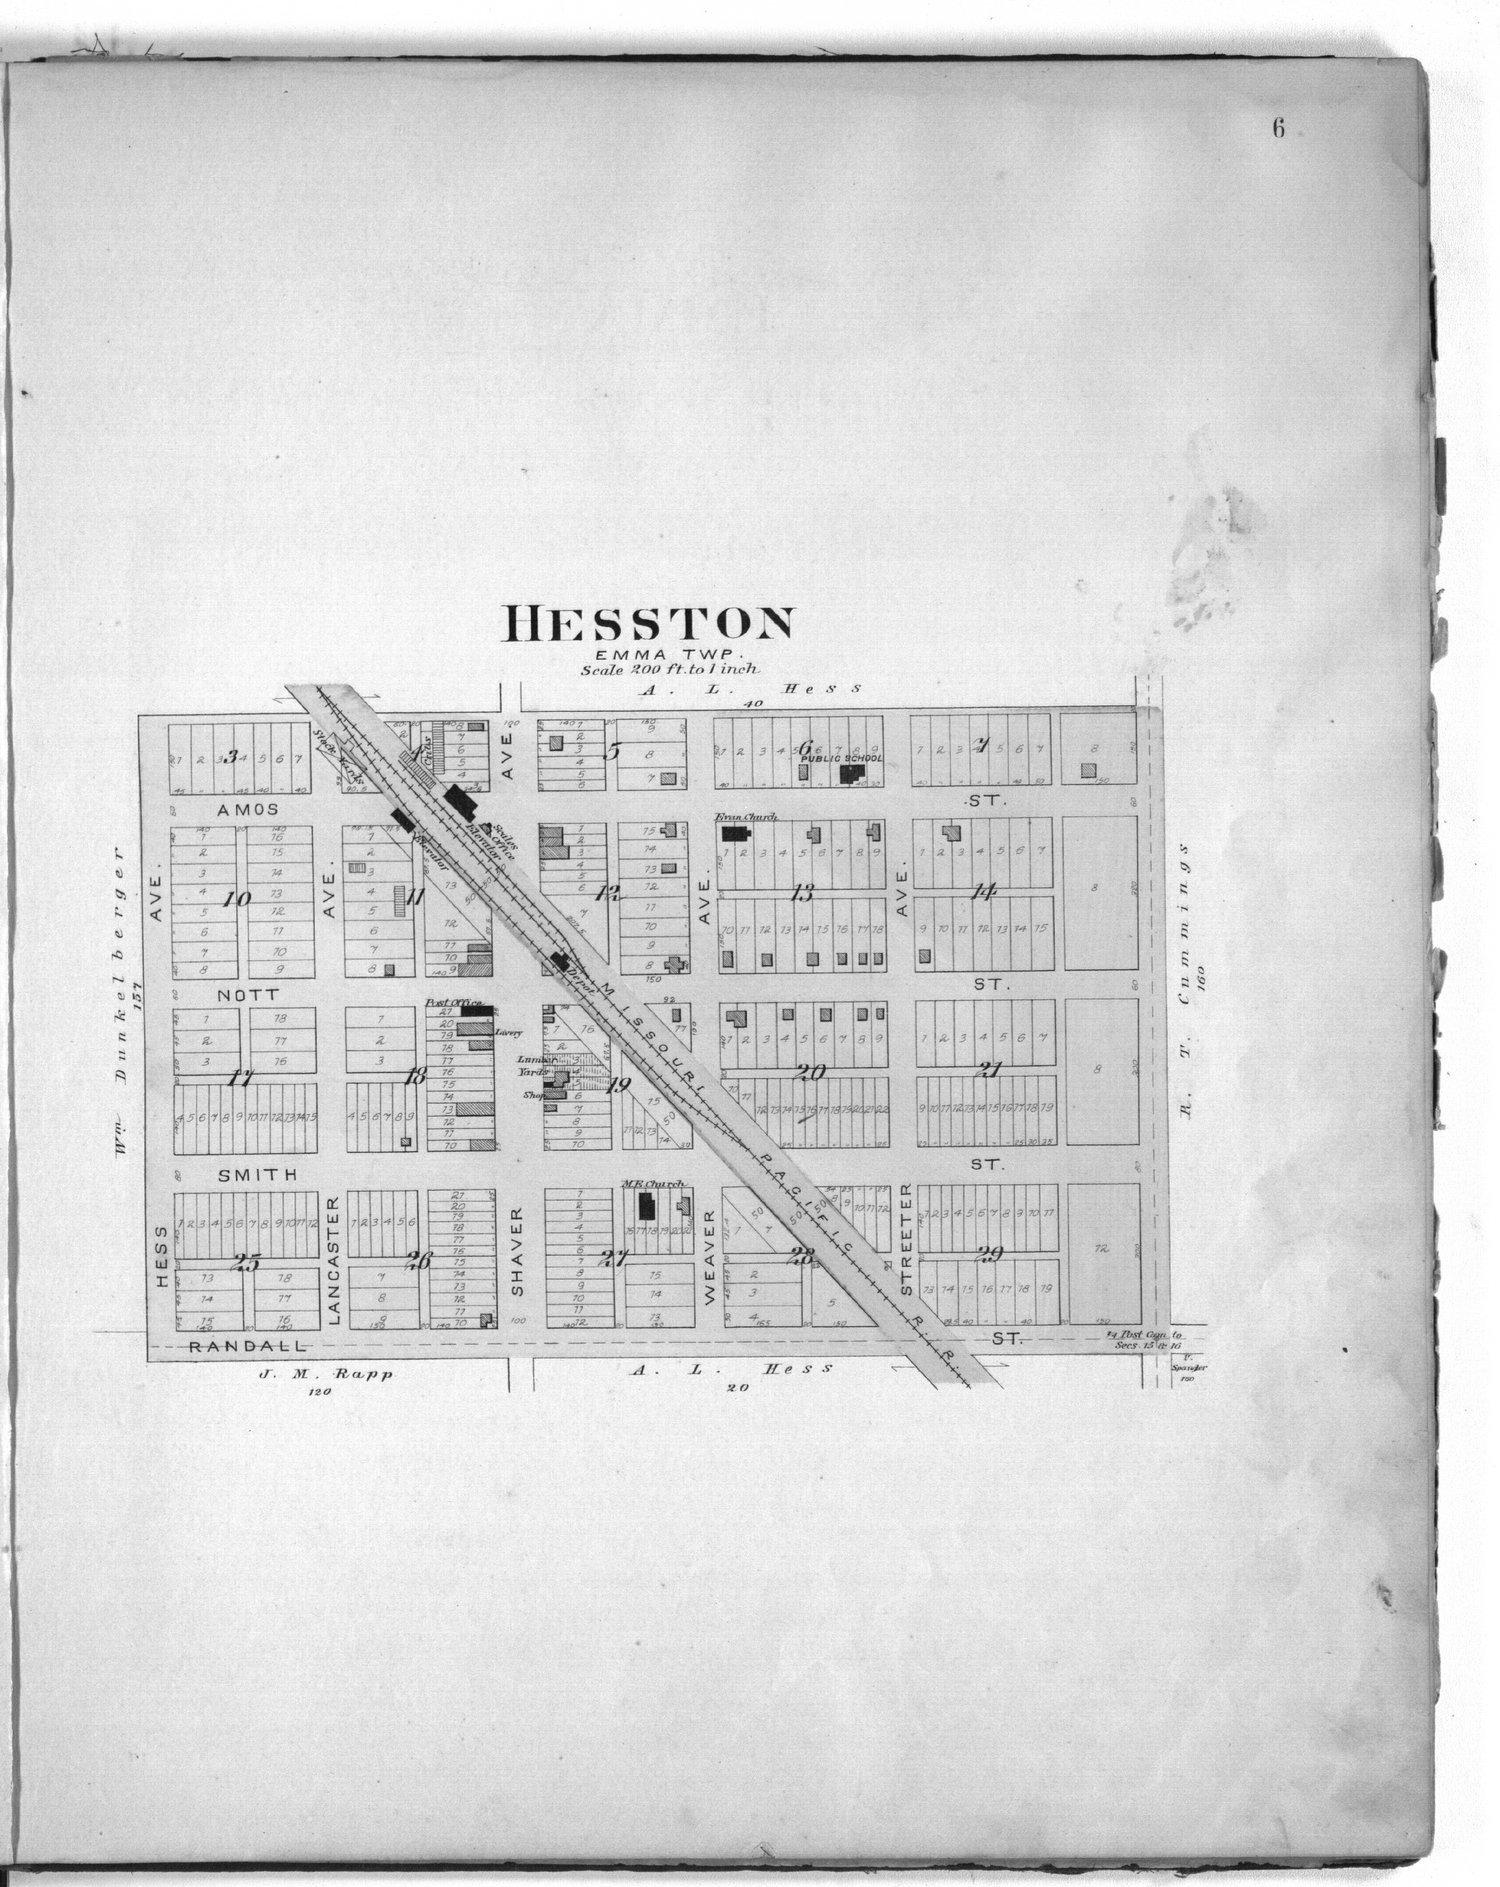 Plat book of Harvey County, Kansas - 6